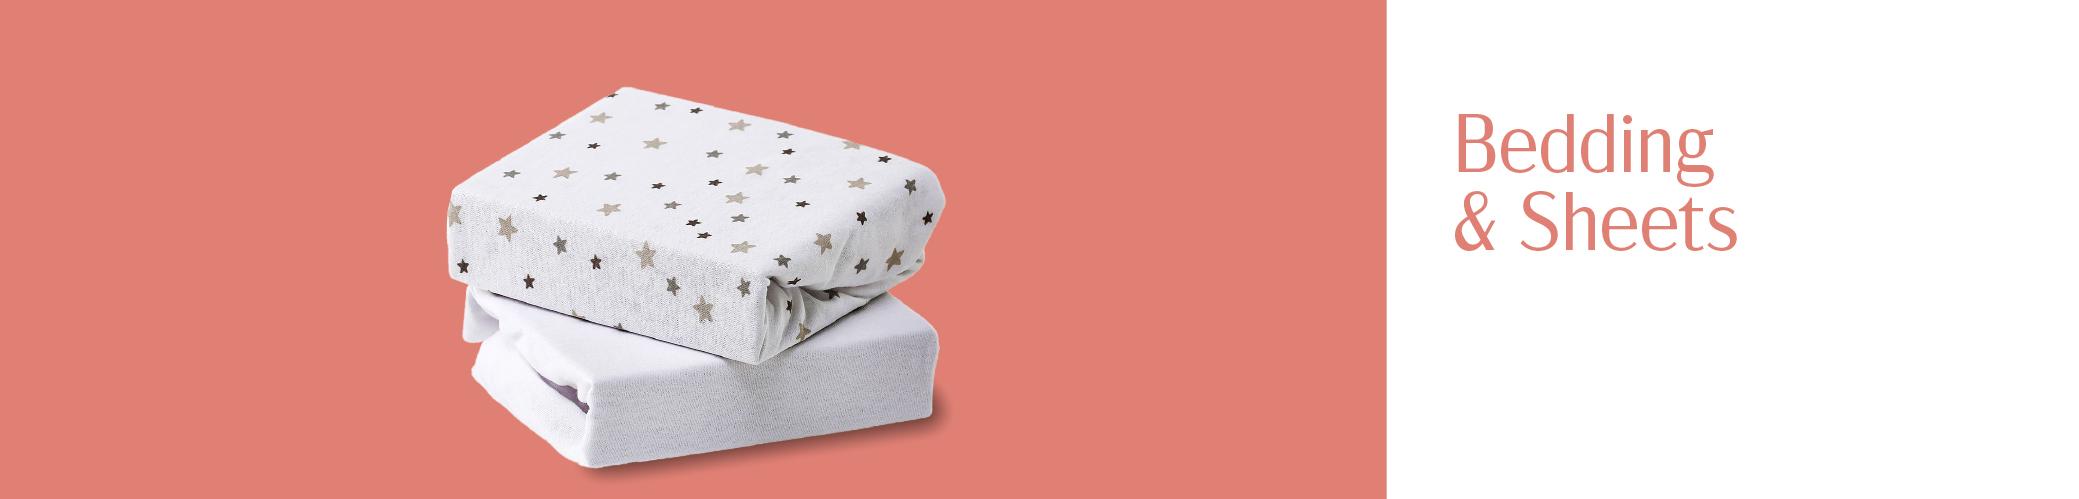 Bedding & Sheets